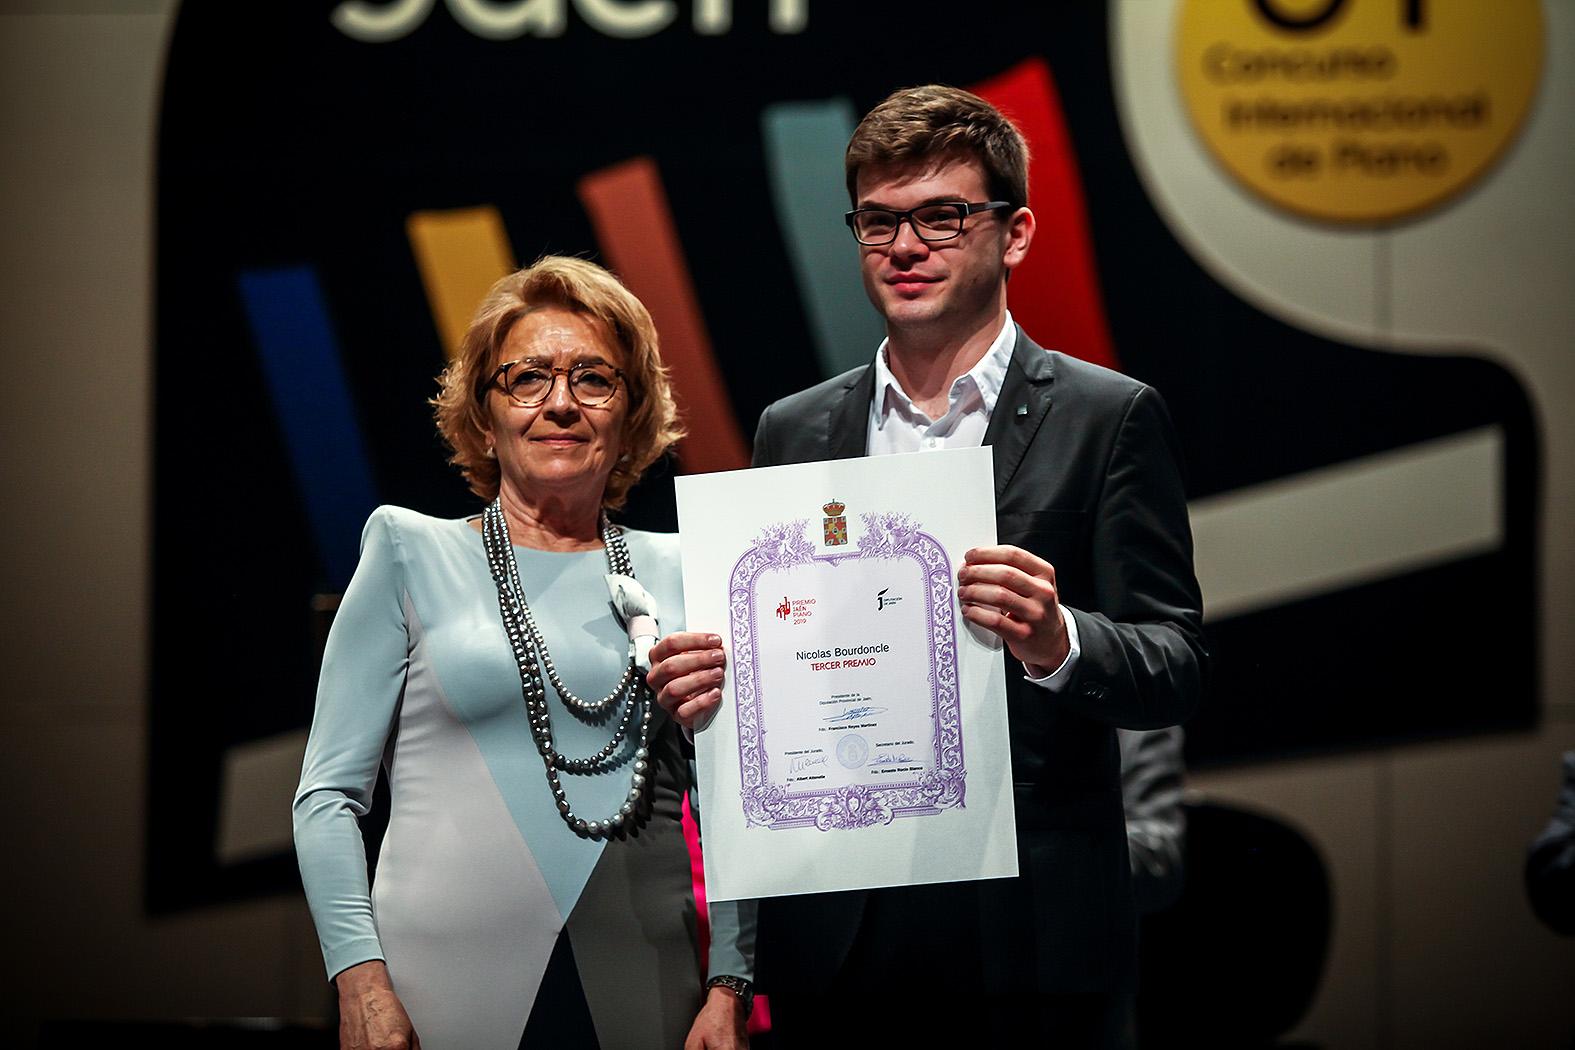 3er Premio: Nicolas Bourdoncle